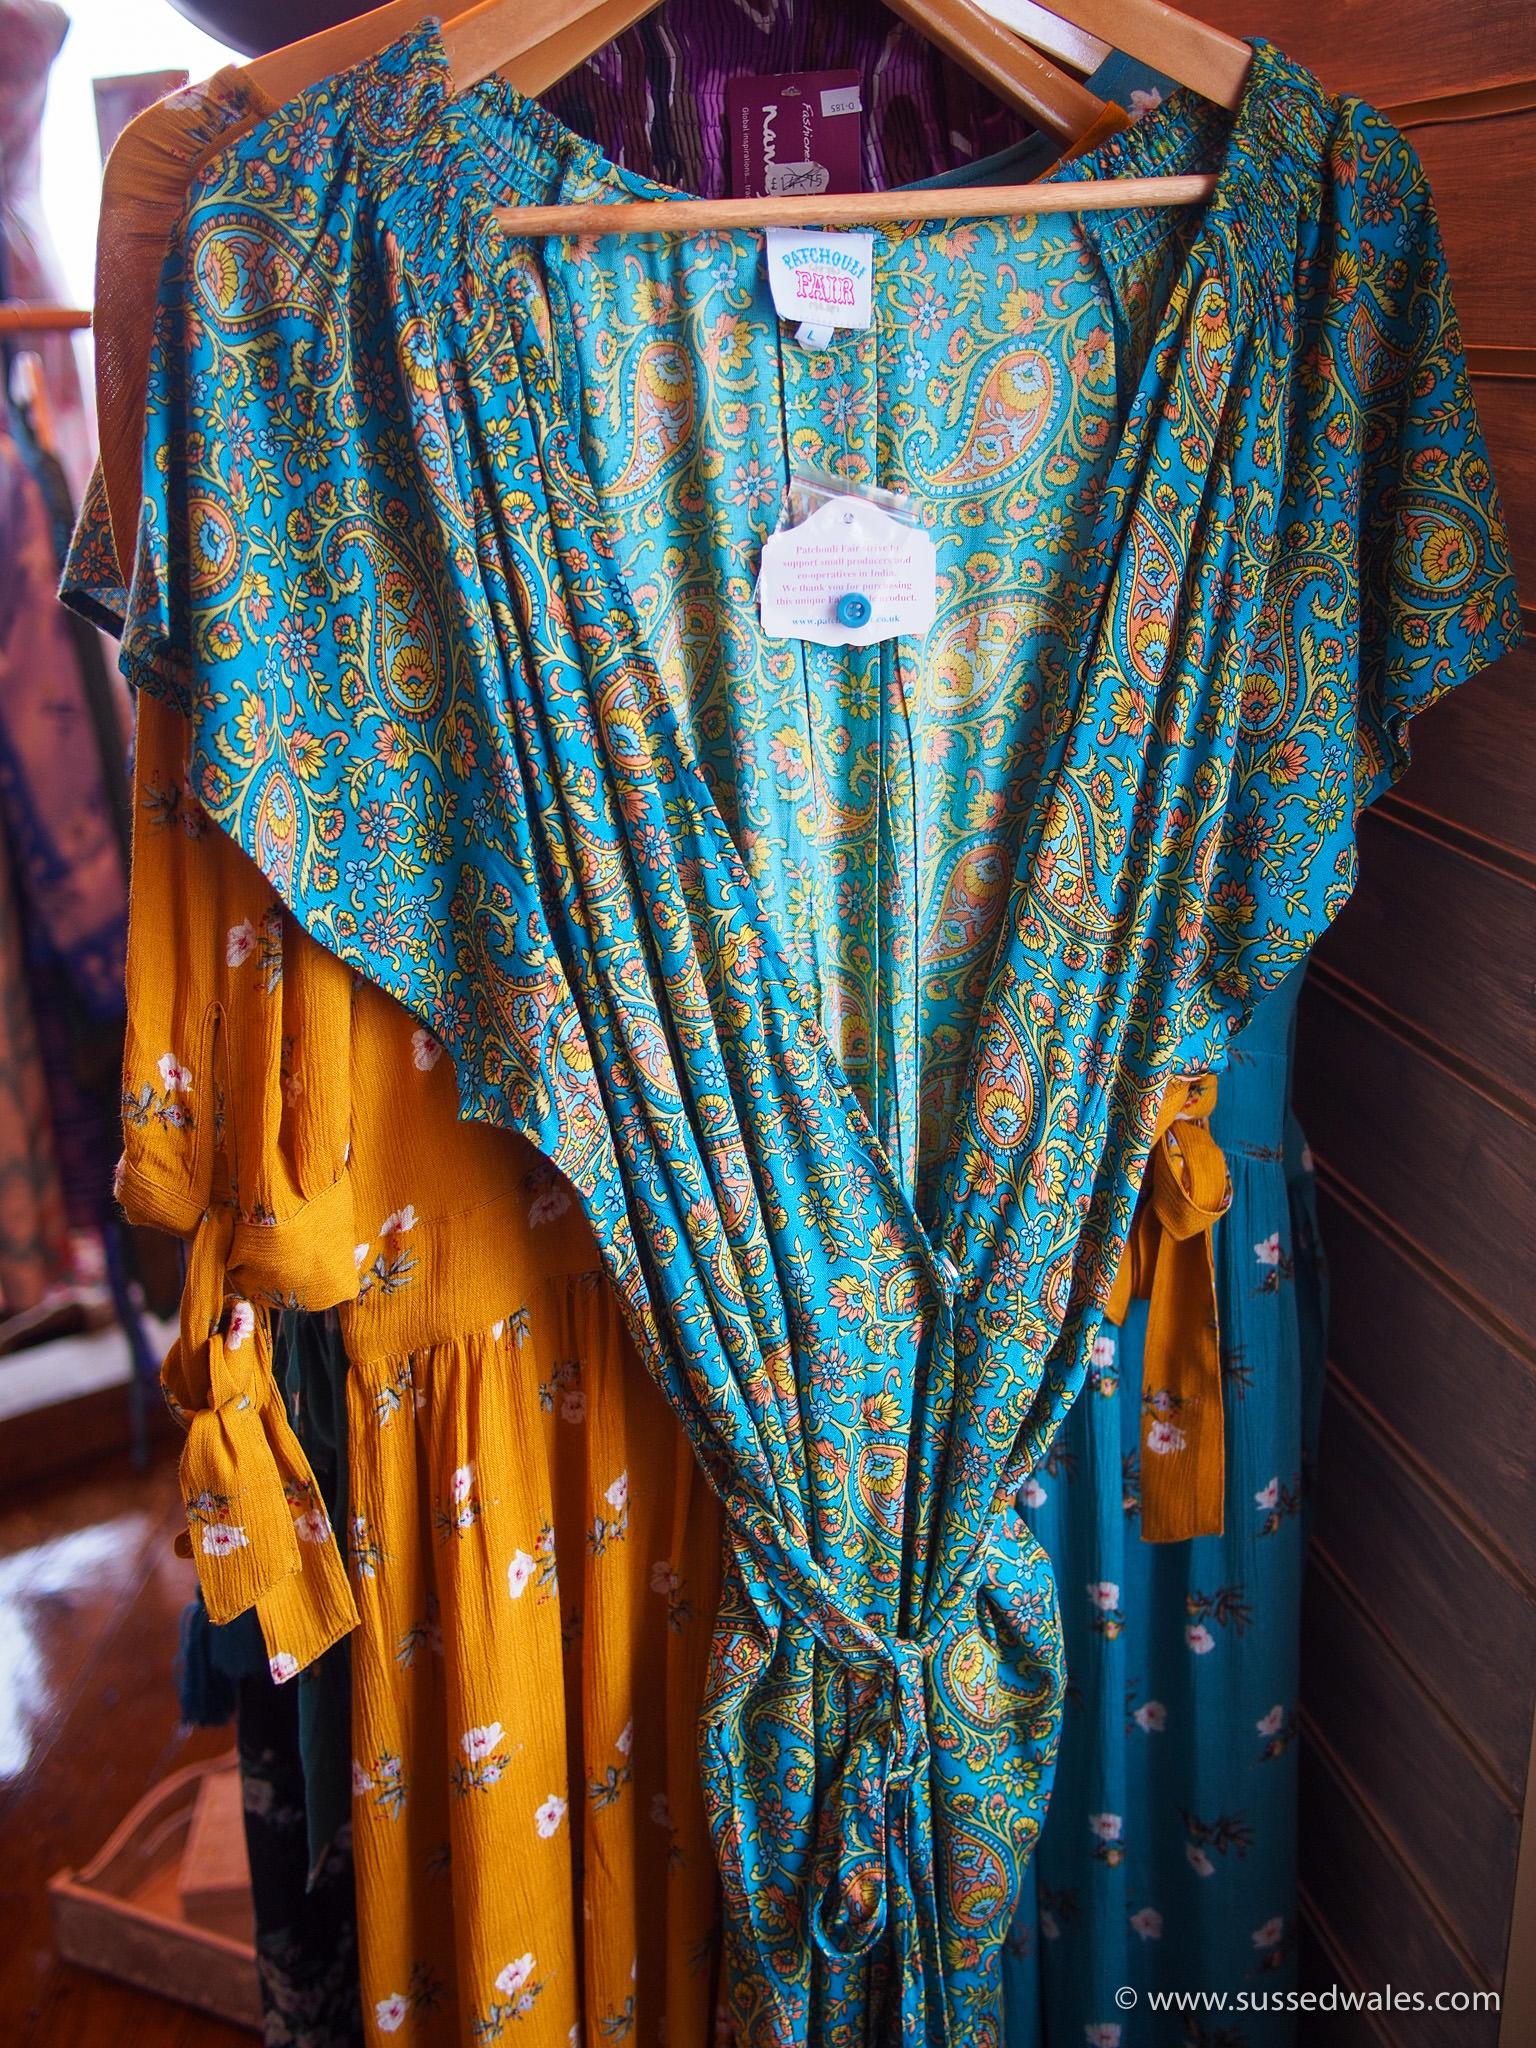 Ethically made dresses